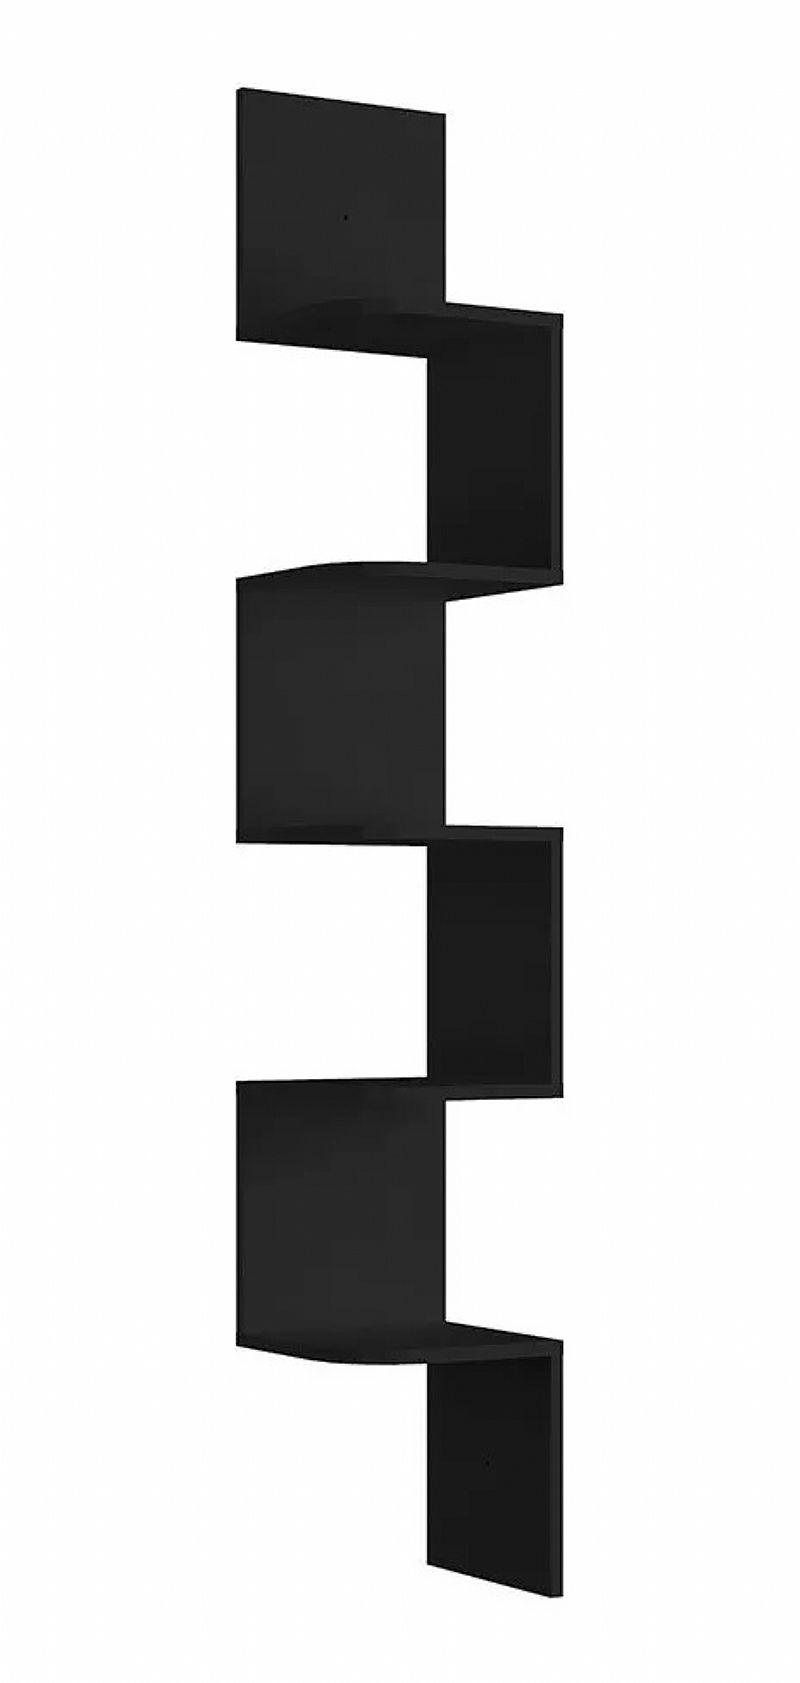 Prateleira Mosaico preta grande decorativo 158x25 preto